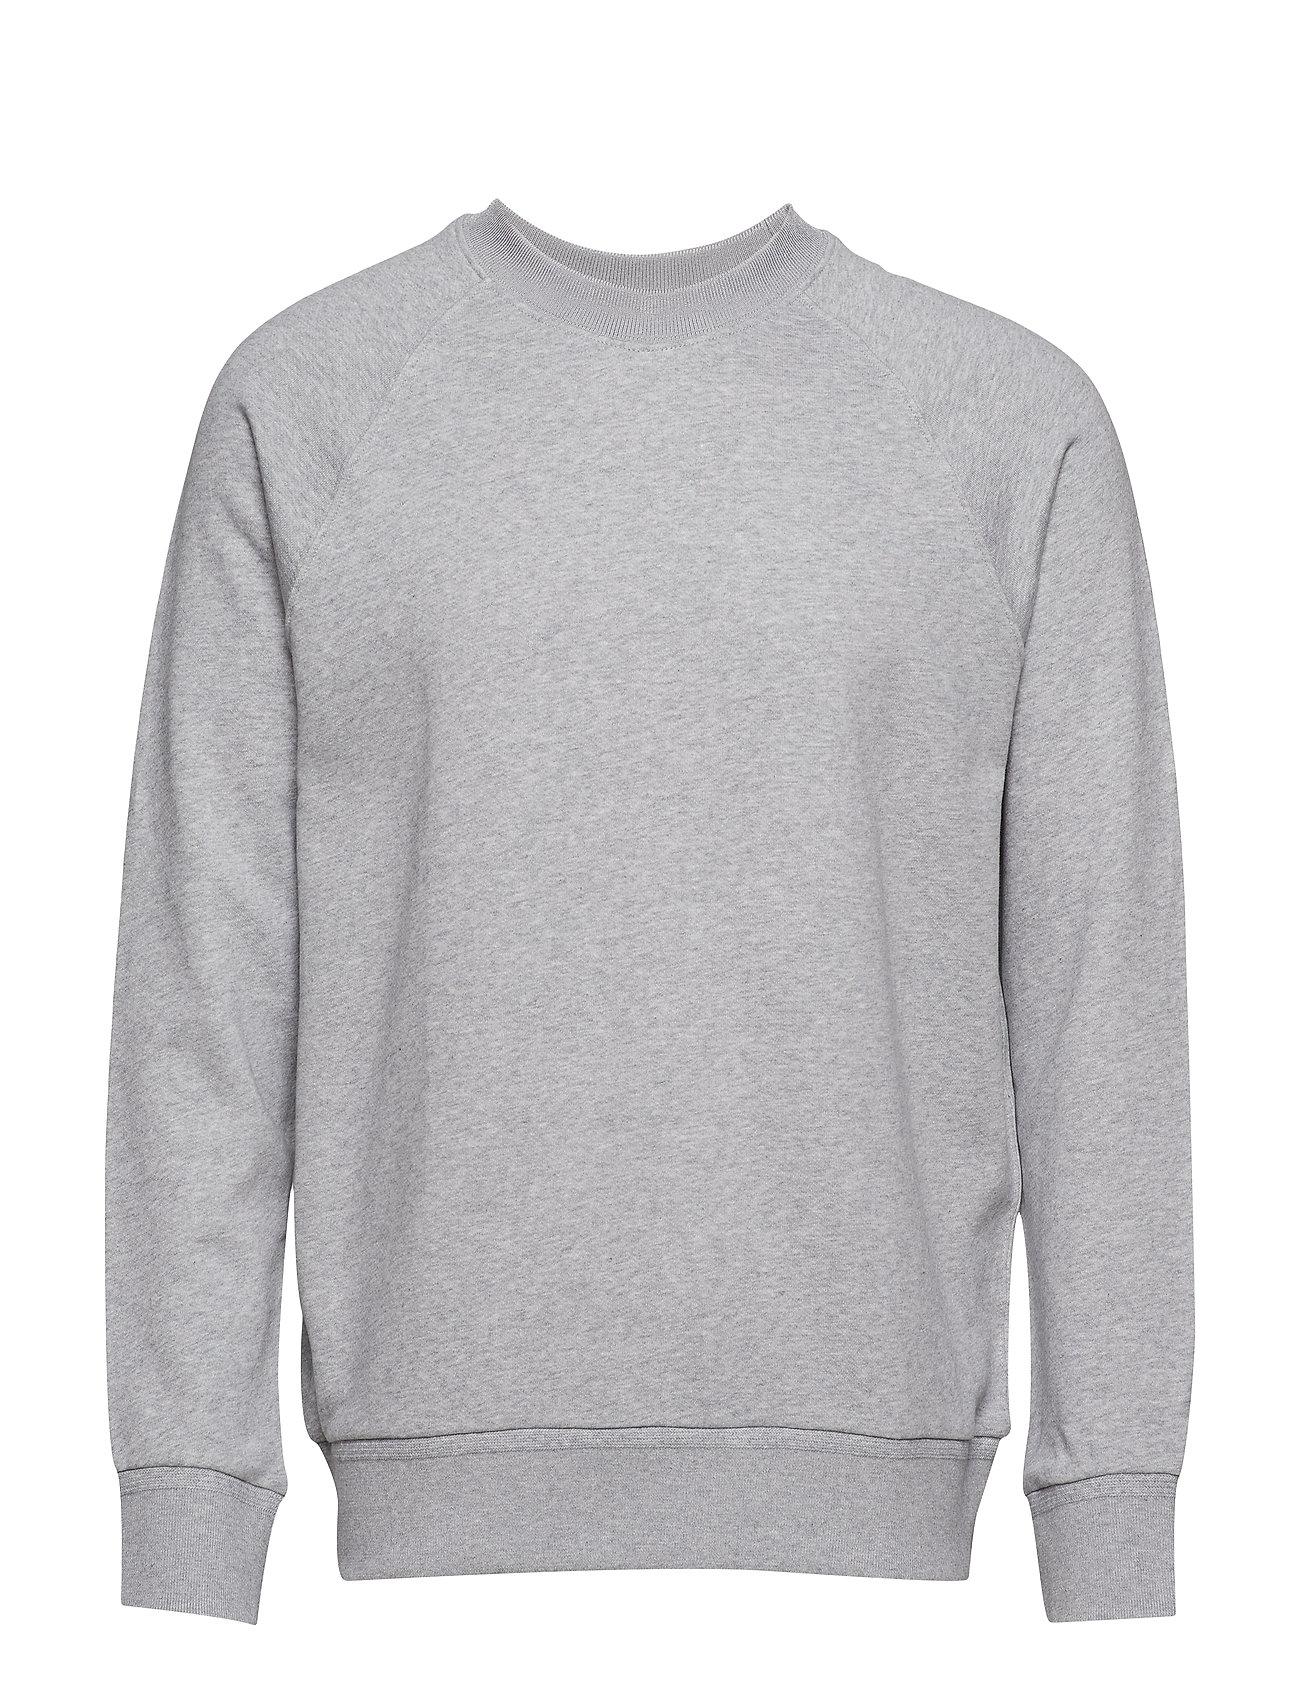 Filippa K M. Tuxedo Sweatshirt - LIGHT GREY